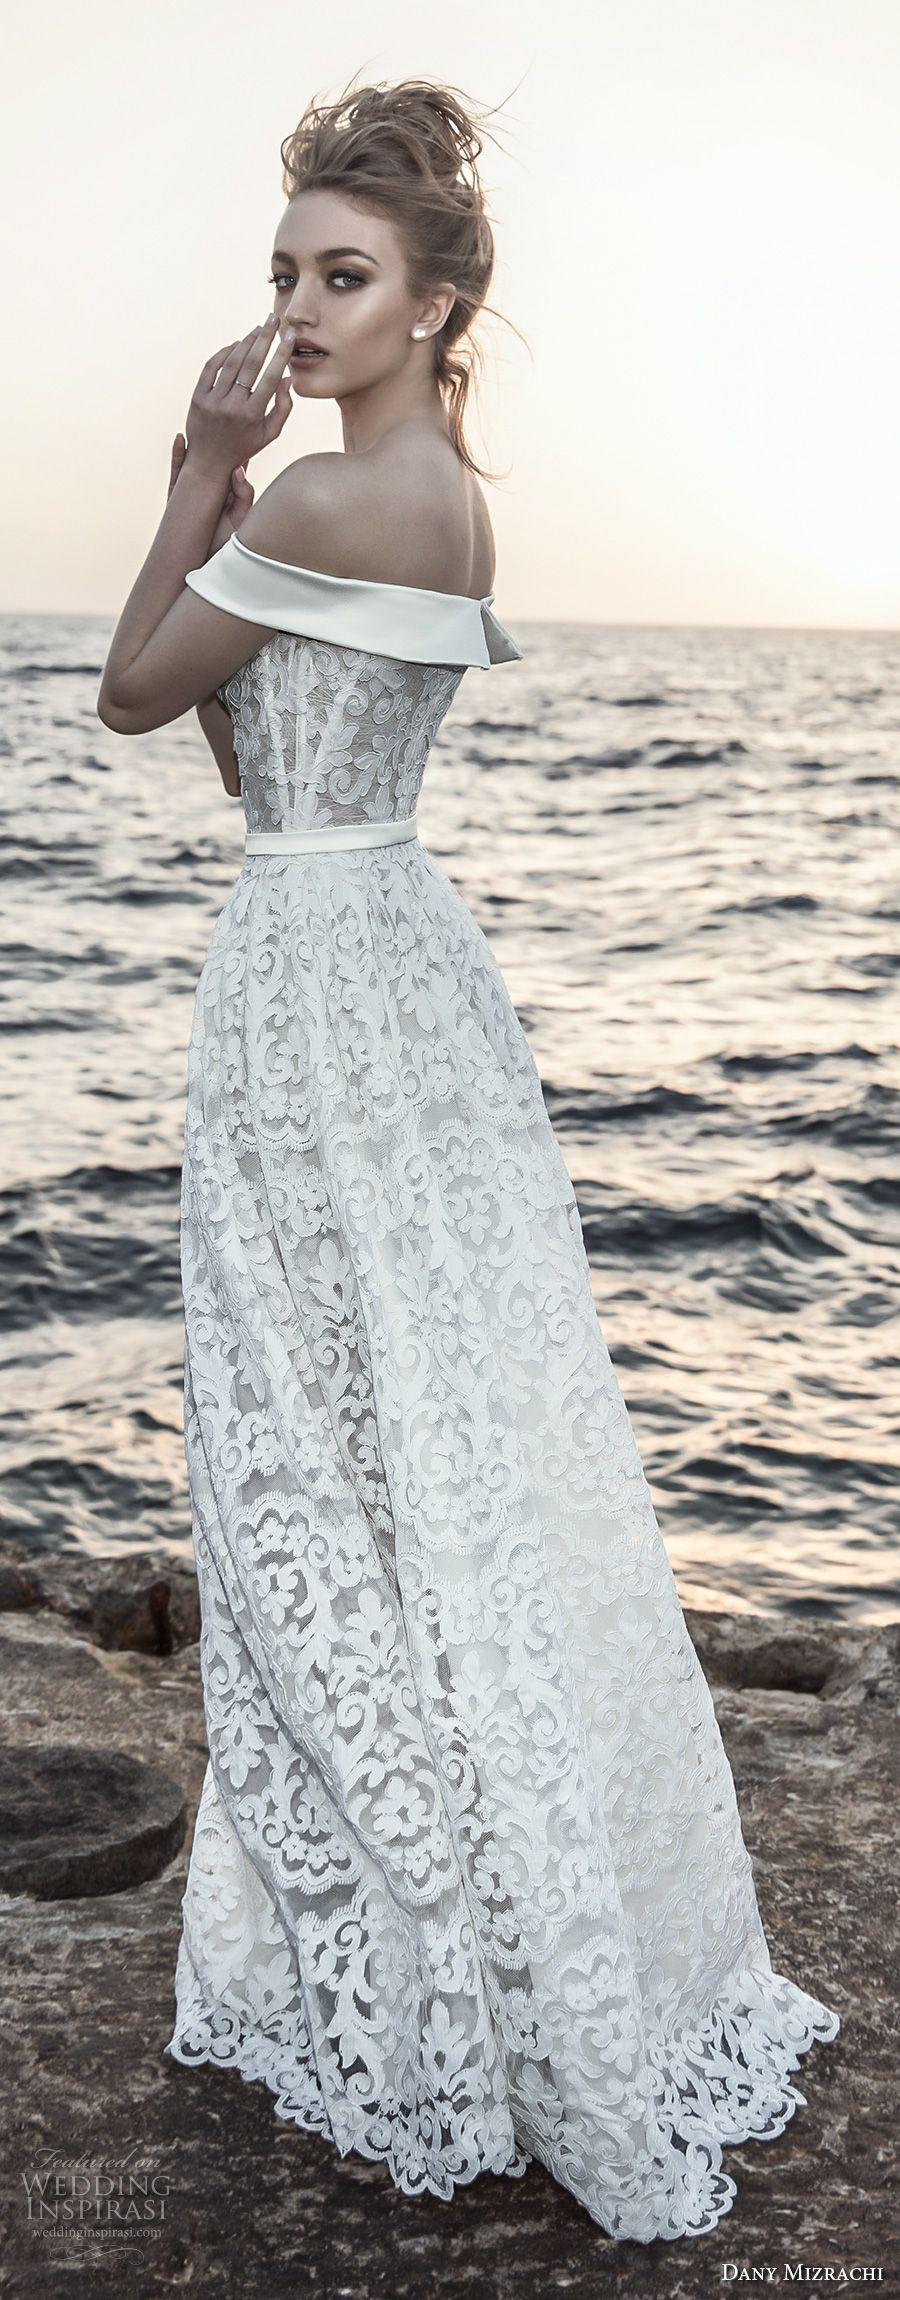 Dany mizrachi bridal off the shoulder straight across neckline